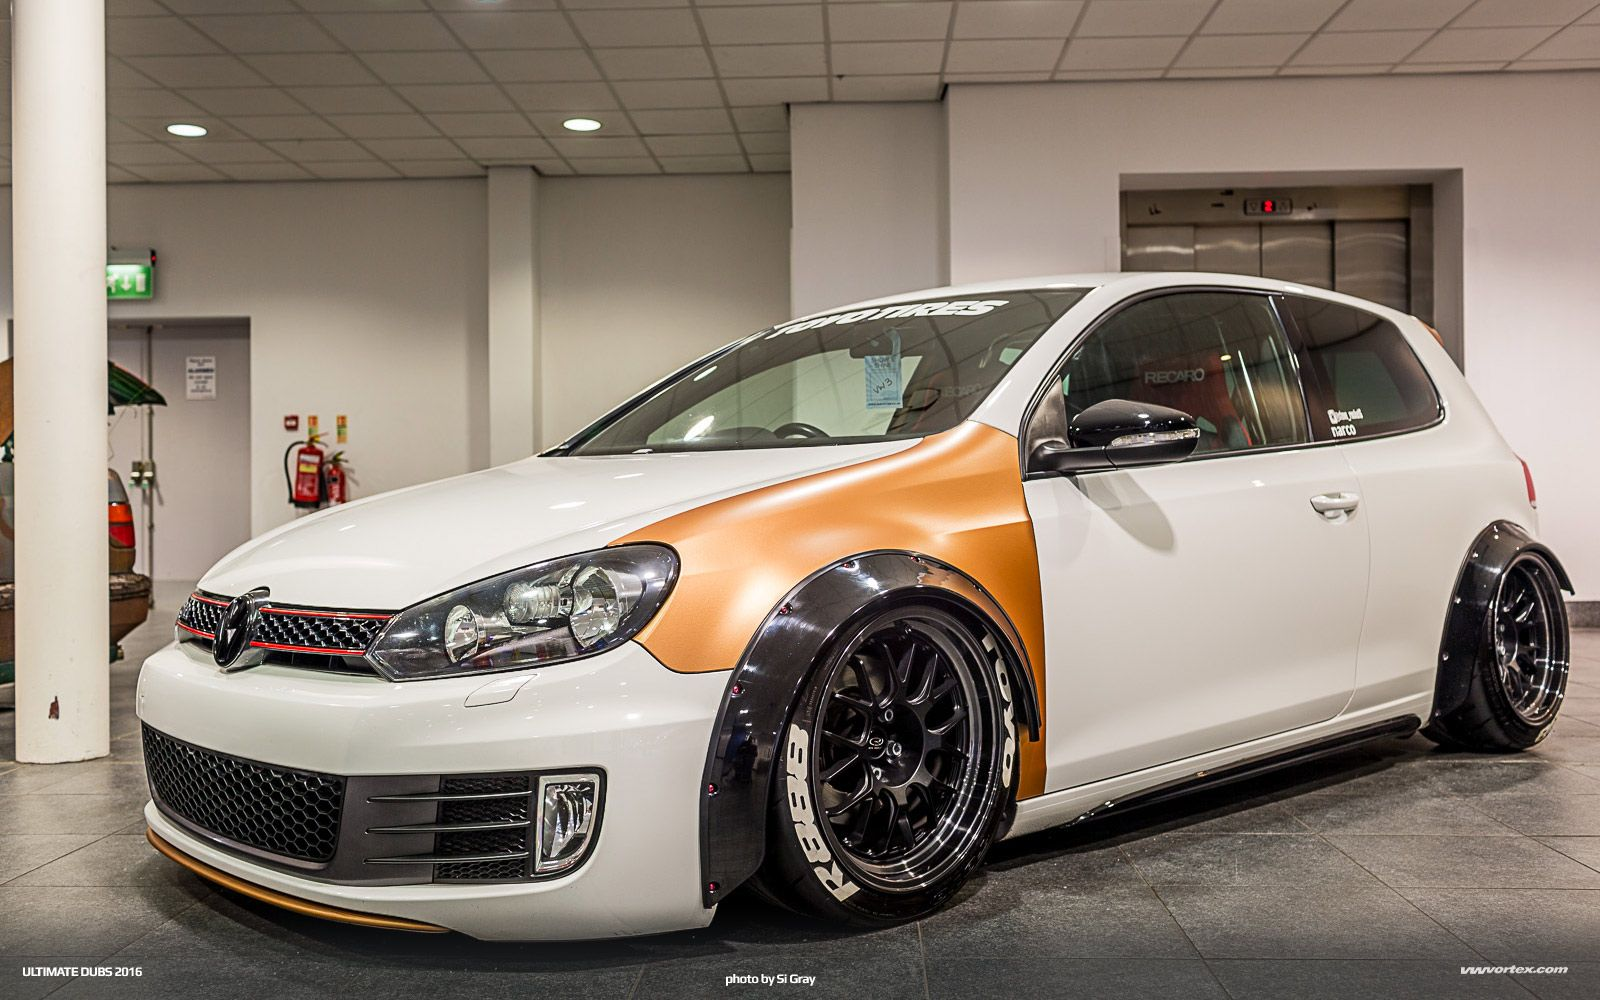 Pin by Steve Sellers on V Dubs Volkswagen, Vw golf, Car